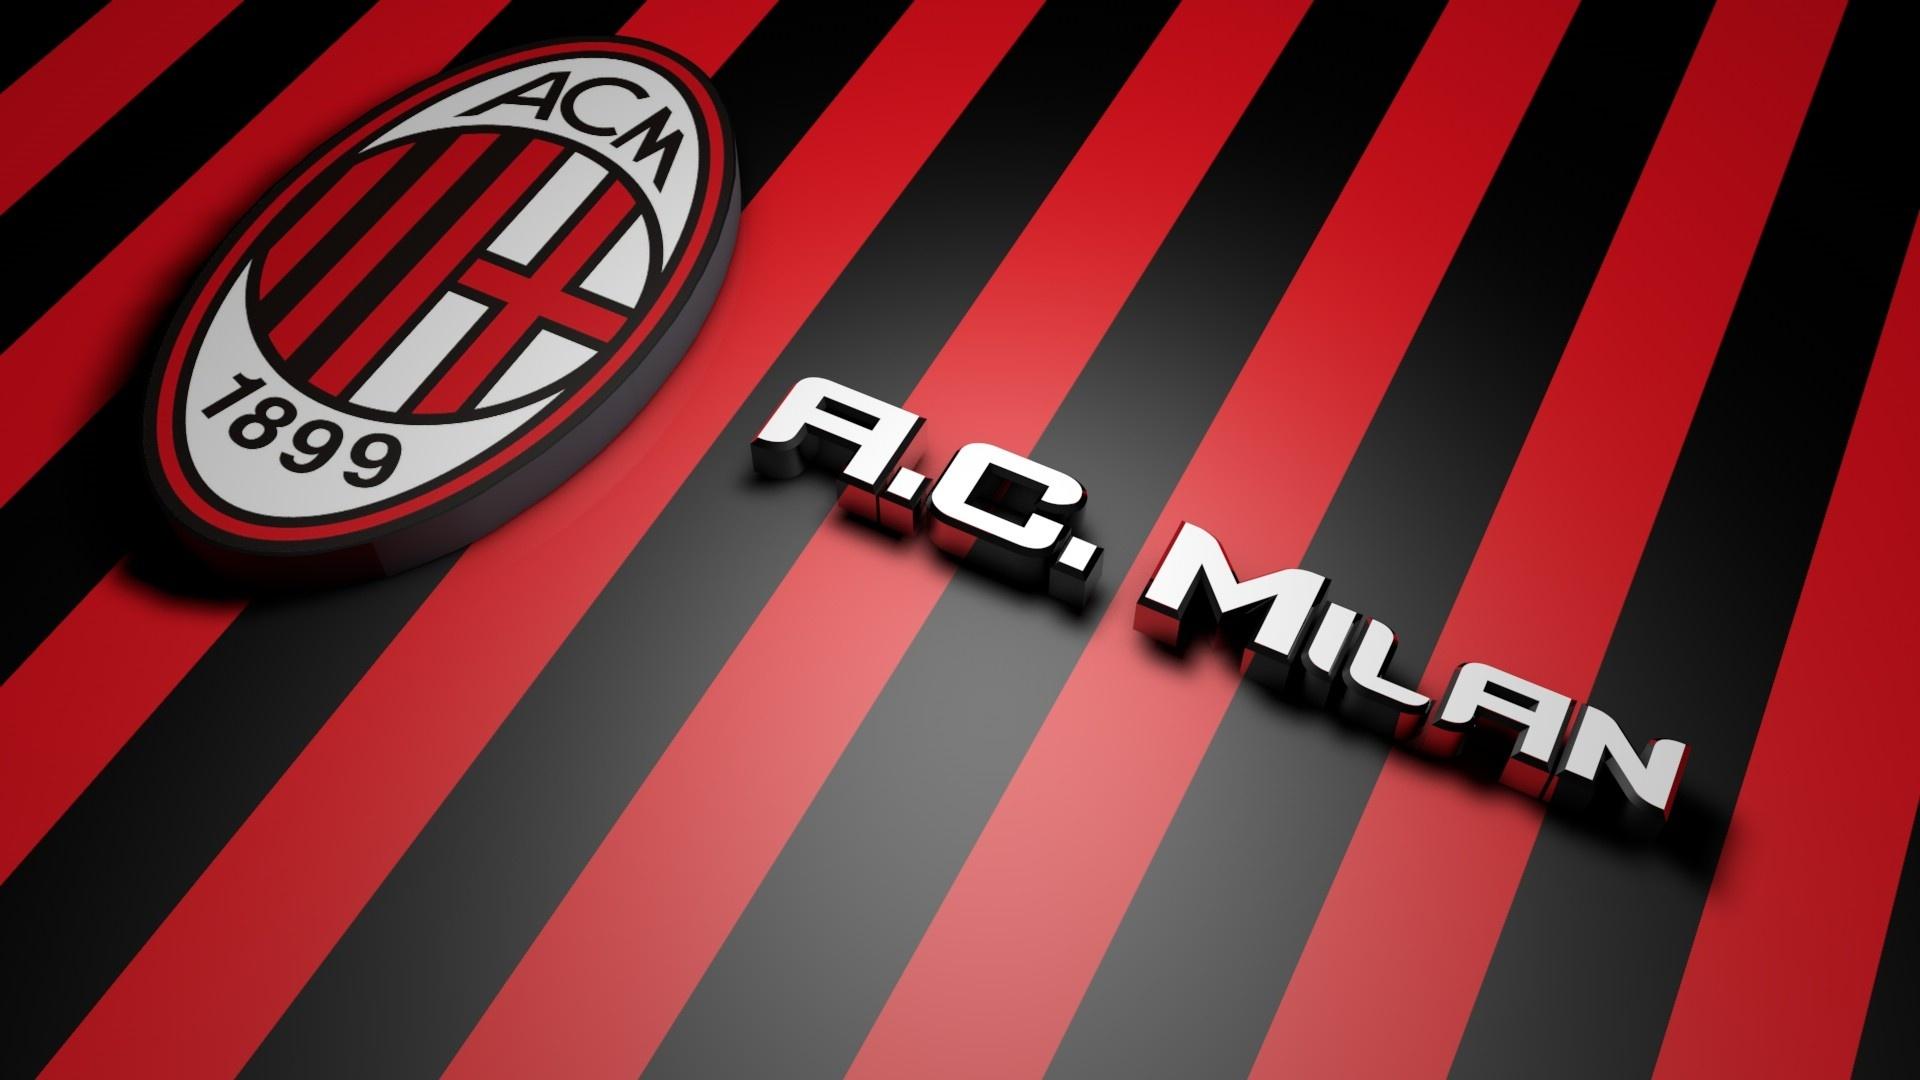 Milan football wallpaper voltagebd Image collections